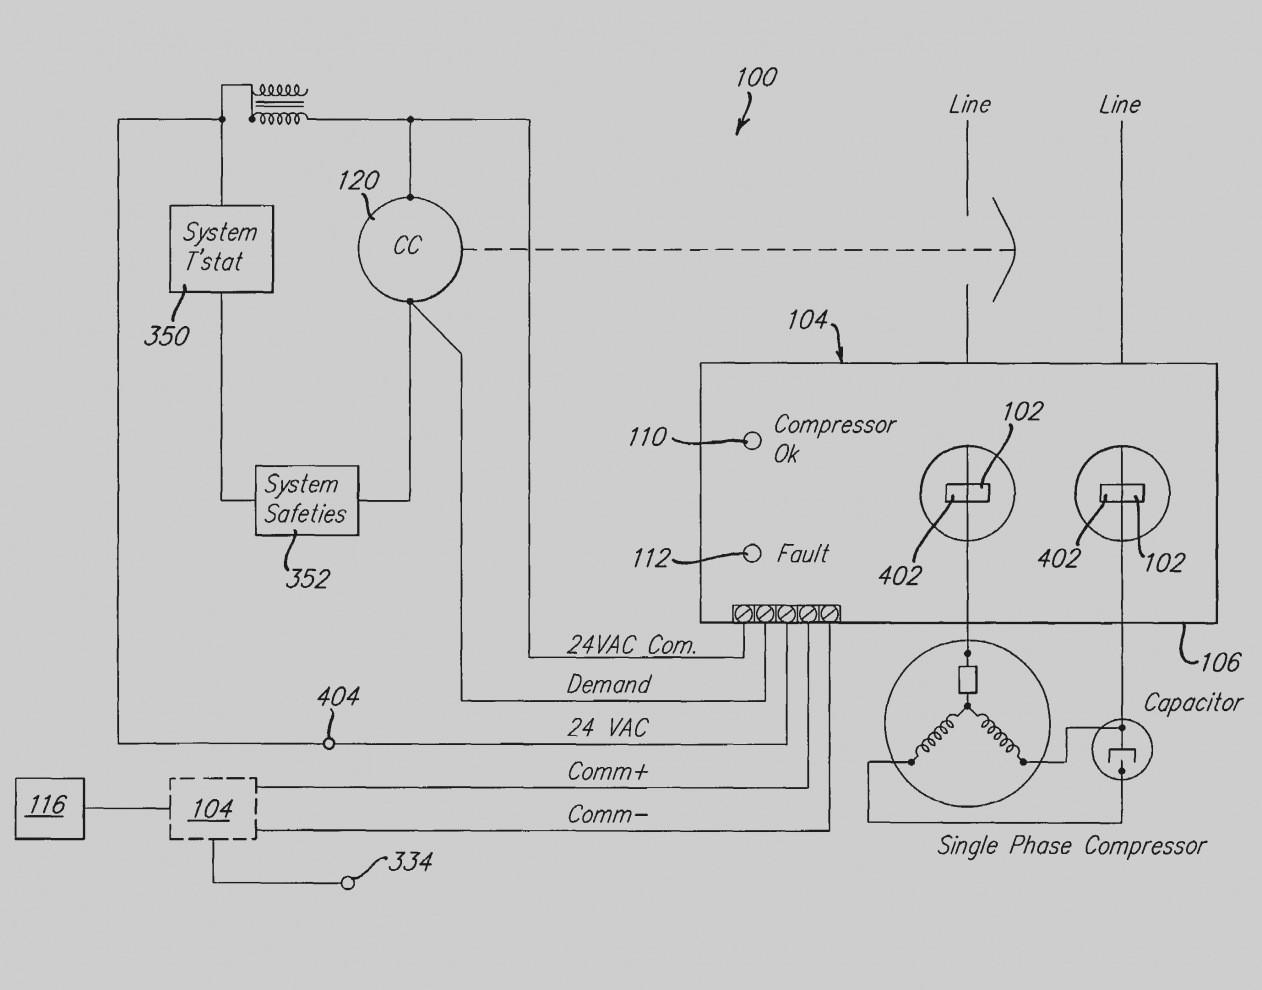 New Copeland pressor Wiring Schematic Diagram Fitfathers Me Stuning Blurts